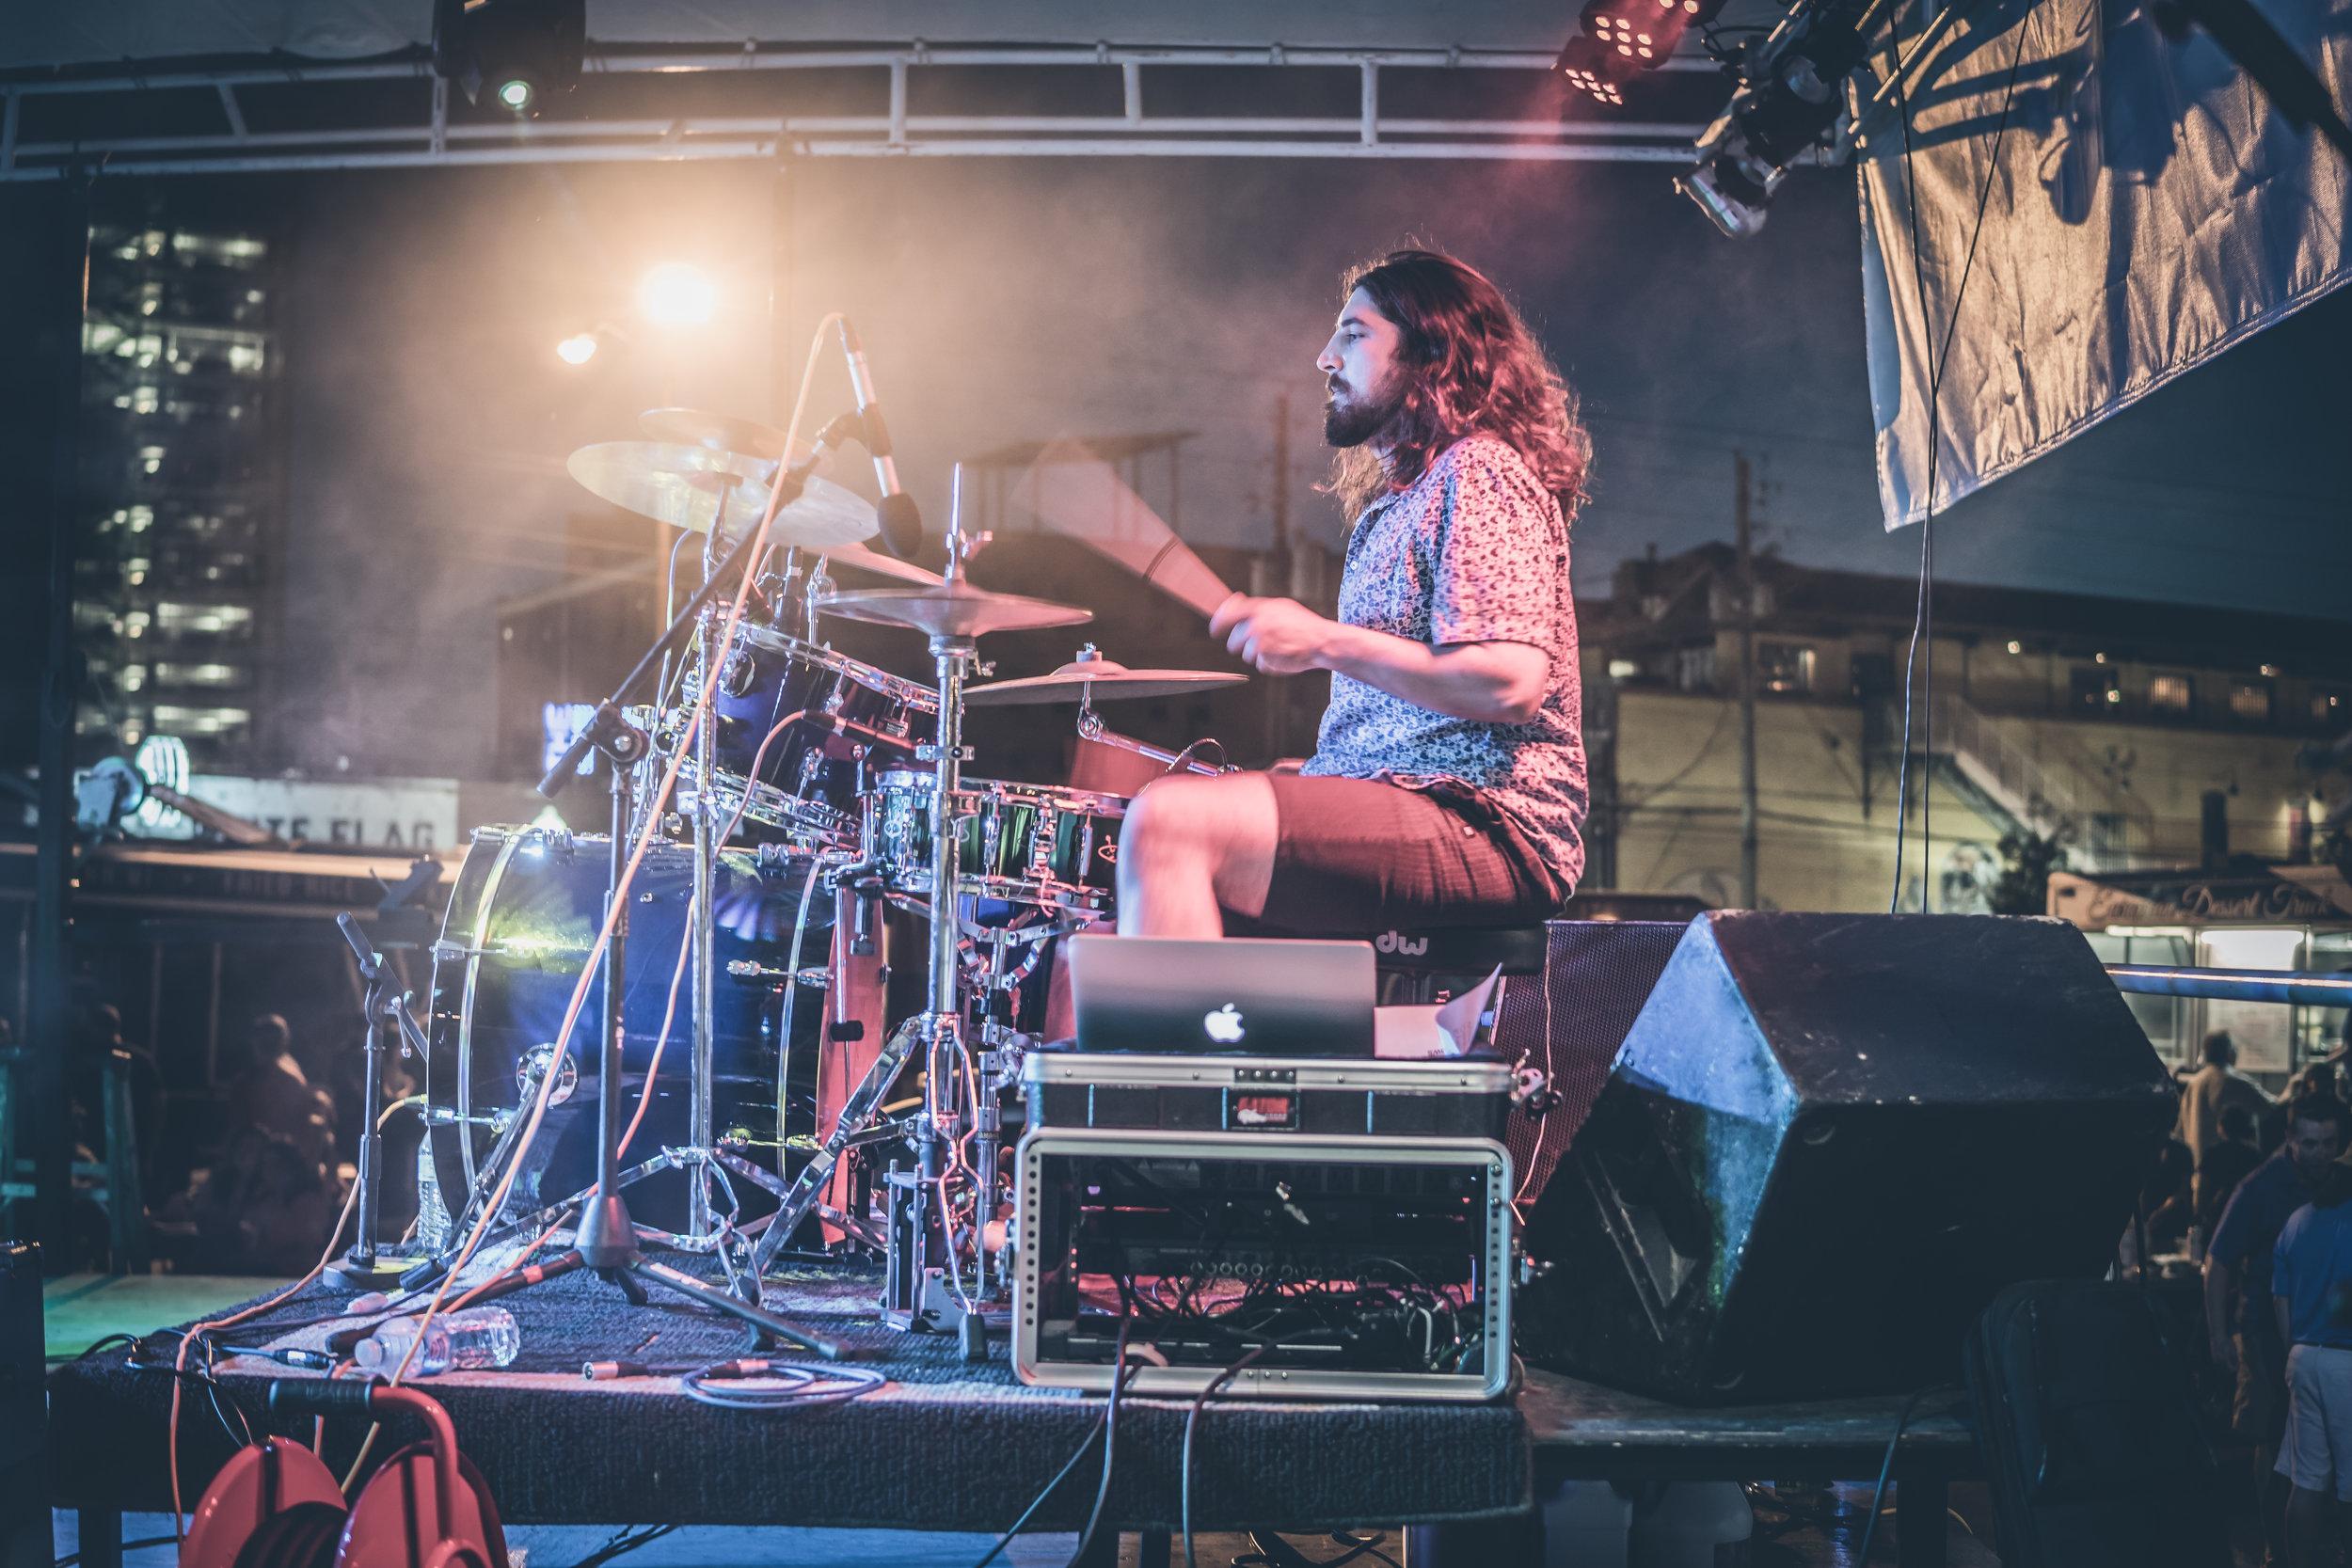 FM Pilots - Blue Dome Arts Festival - Tulsa, OK 052116-6.jpg